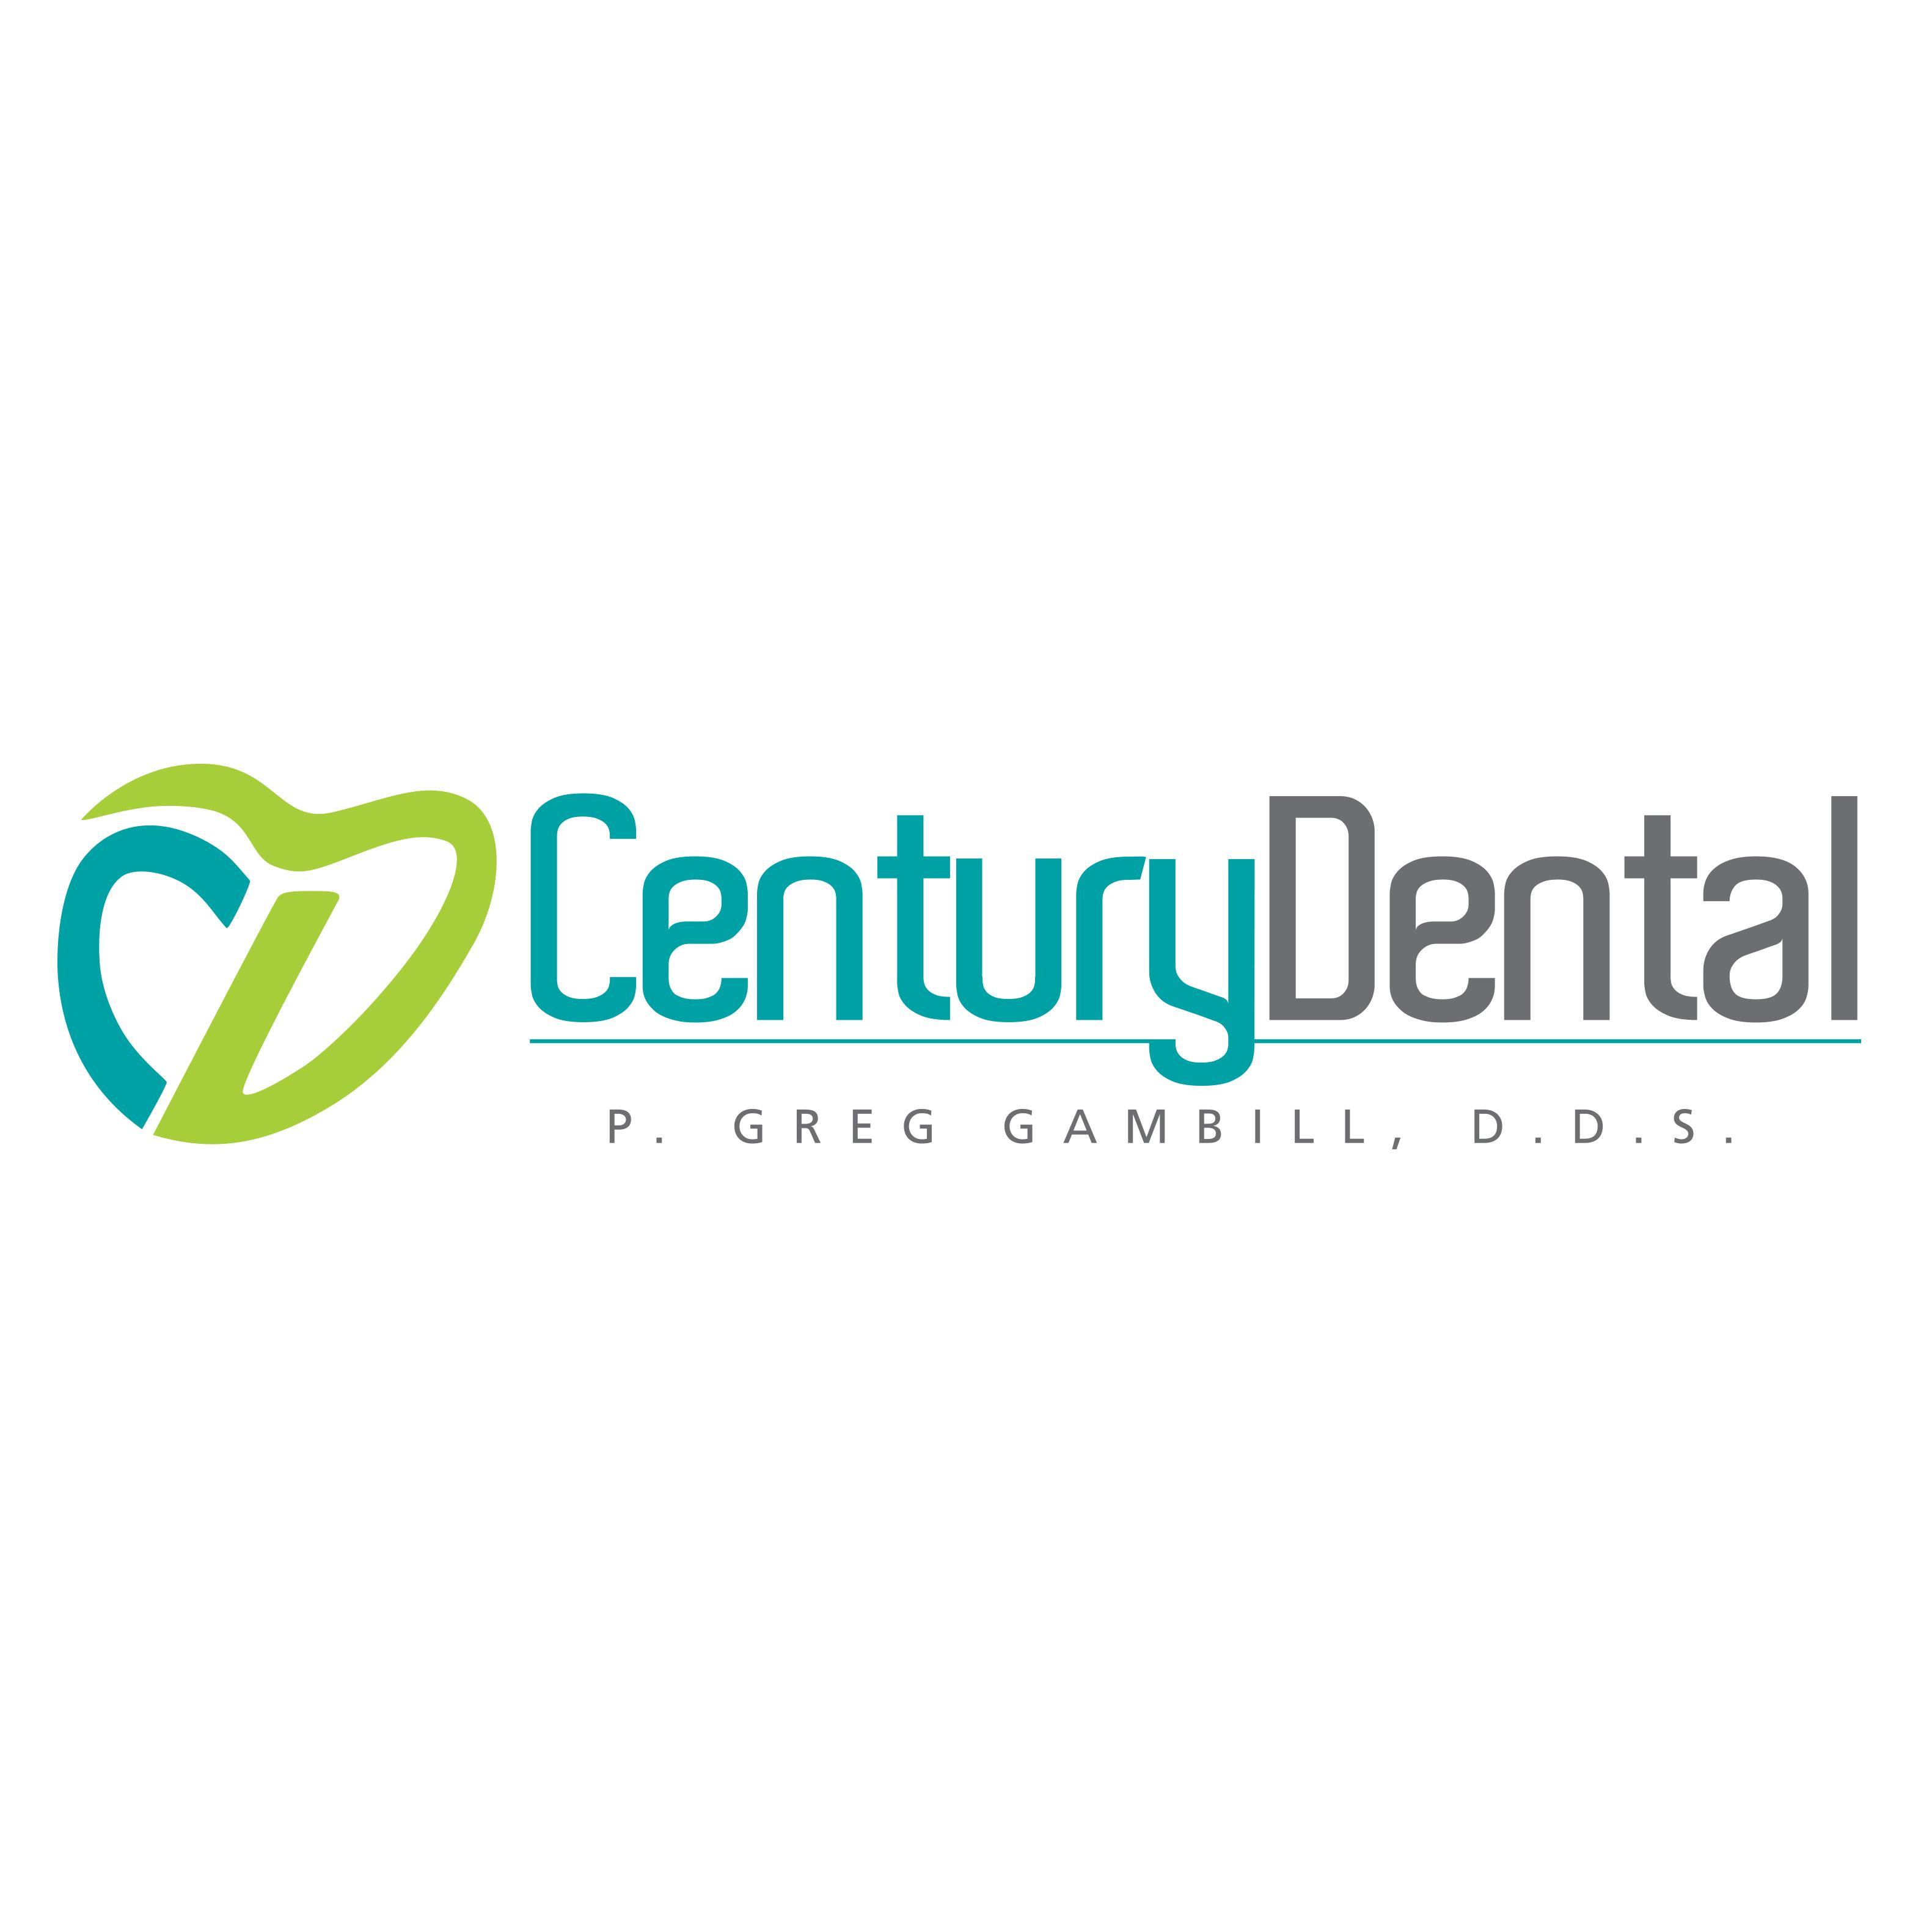 Century Dental - P. Greg Gambill, D.D.S.